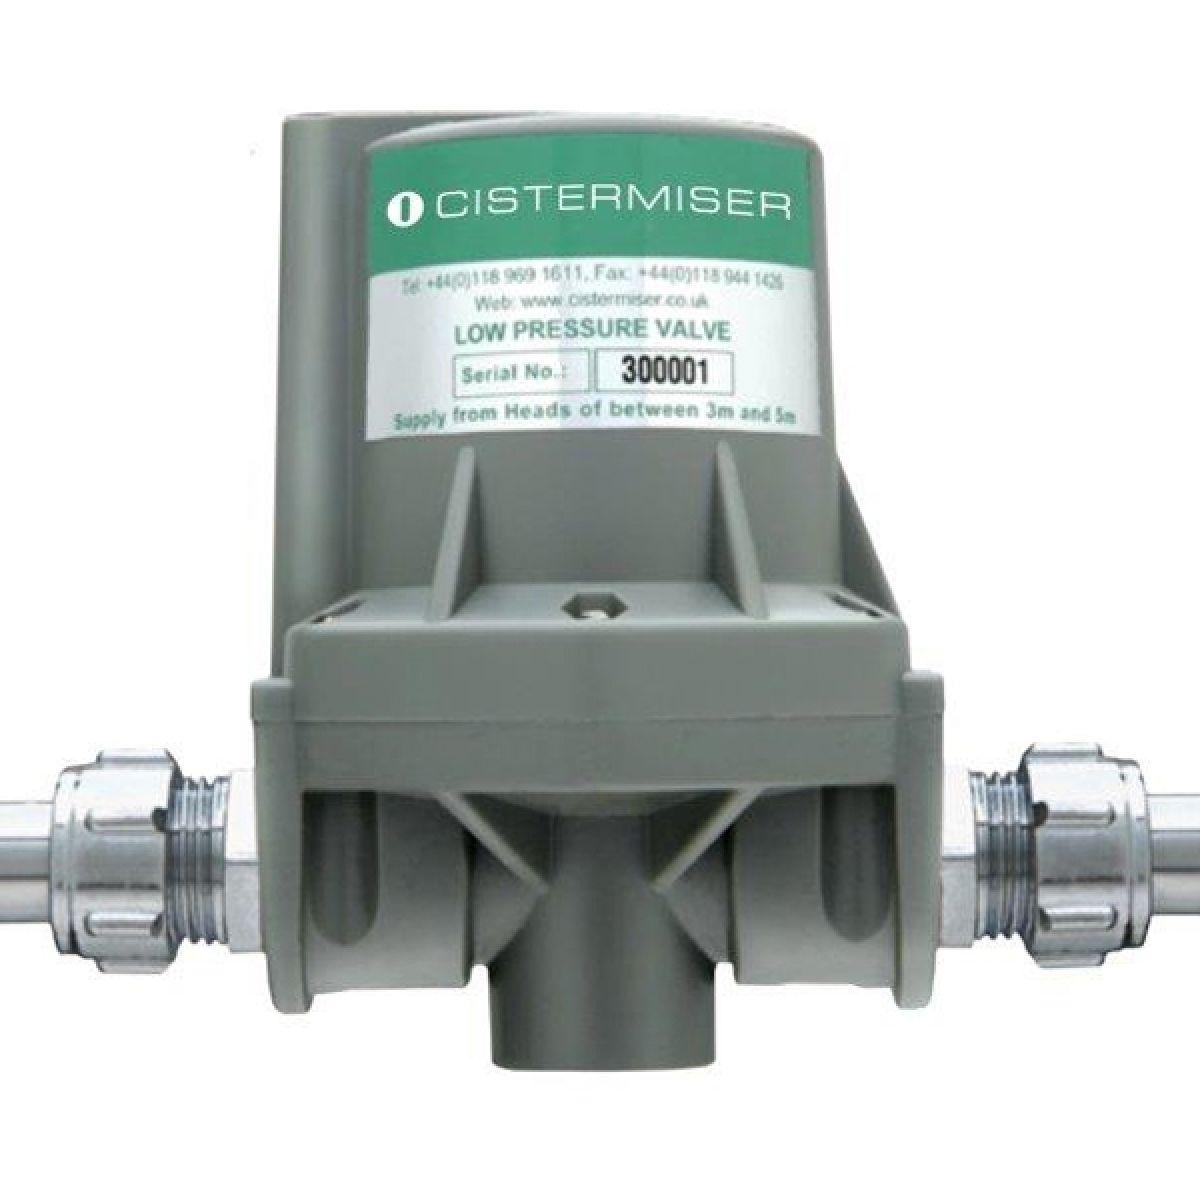 Cistermiser Low Pressure Automatic Urinal Flush Control Valve